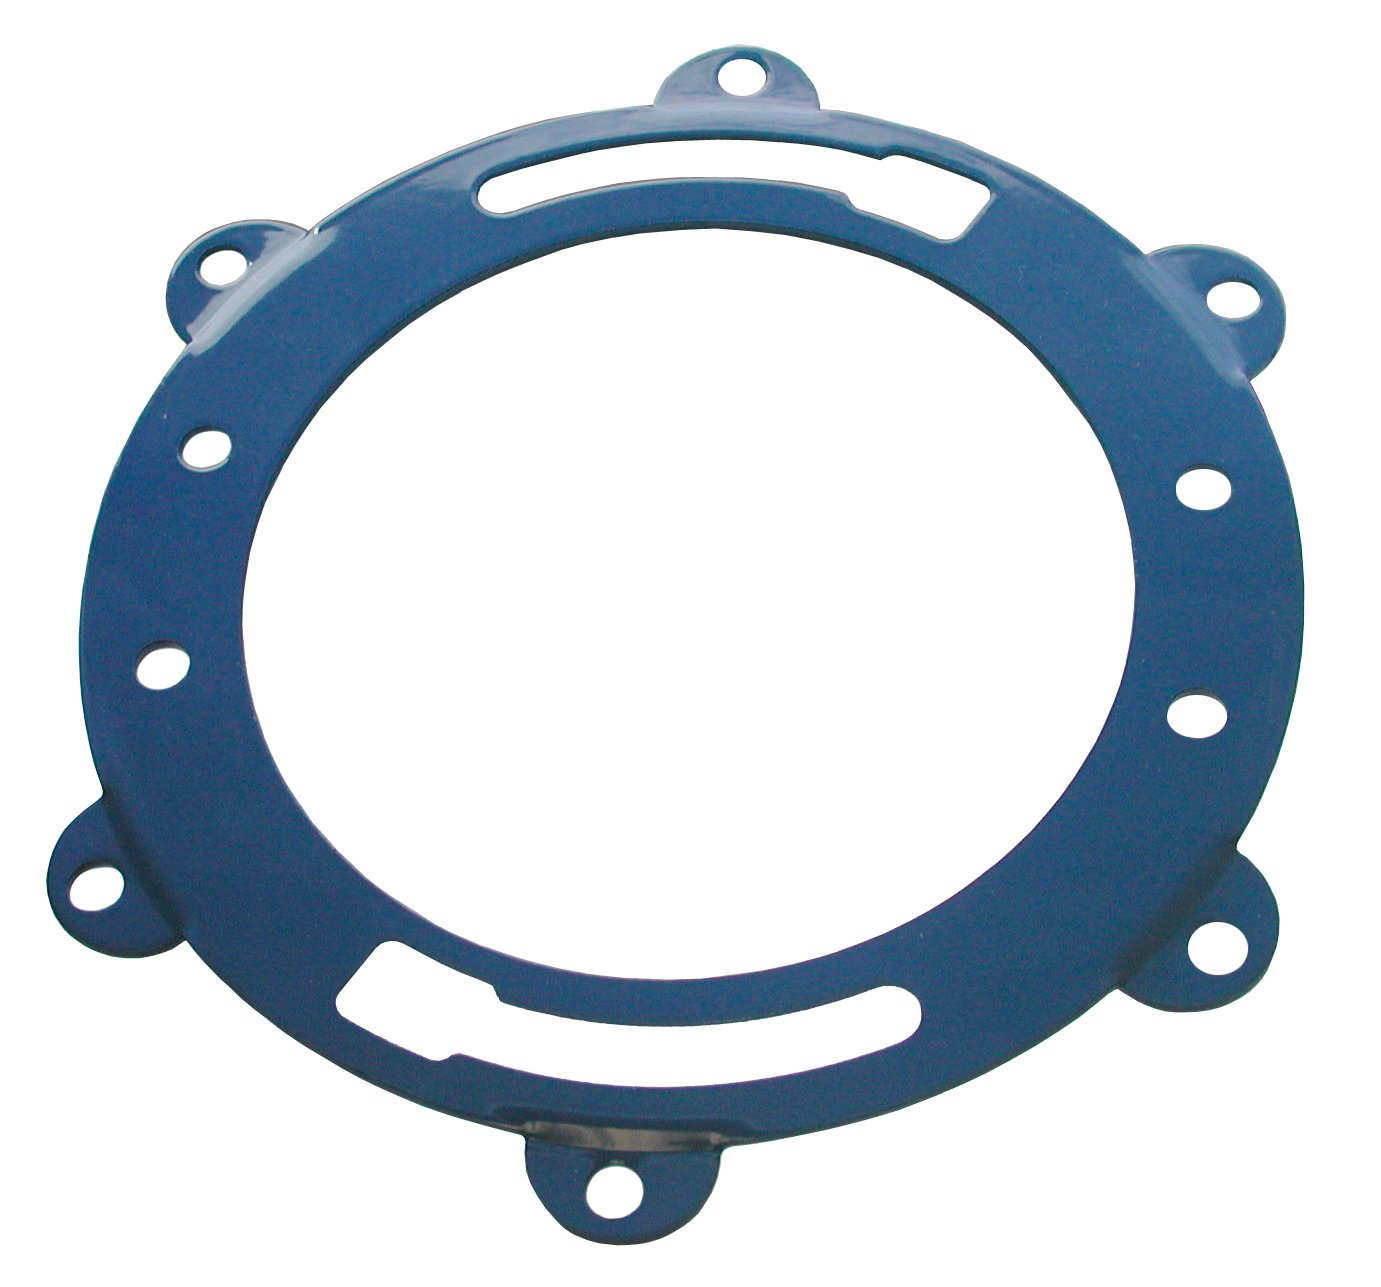 PlumBest C85000 Ultra Fit Metal Closet Flange Repair Ring C85000R